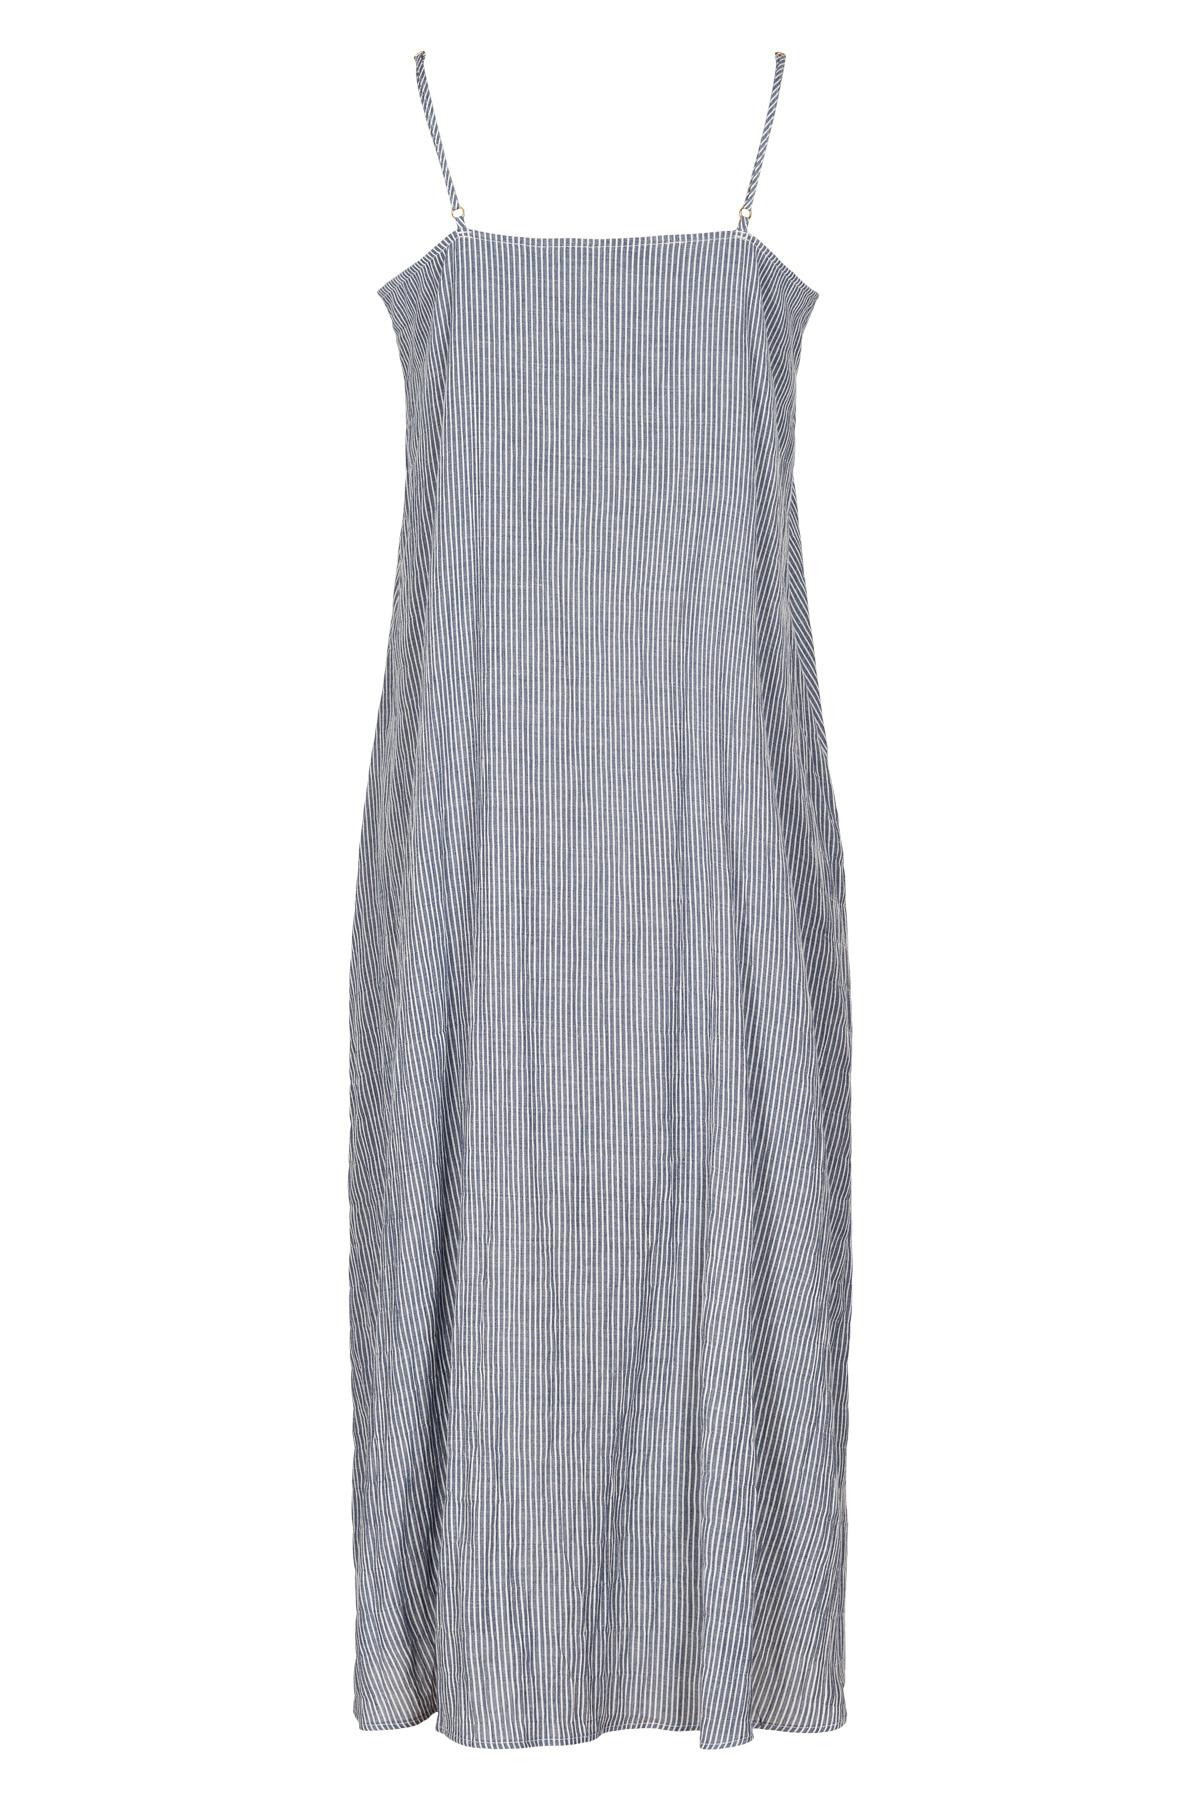 AndLess Shela Dress